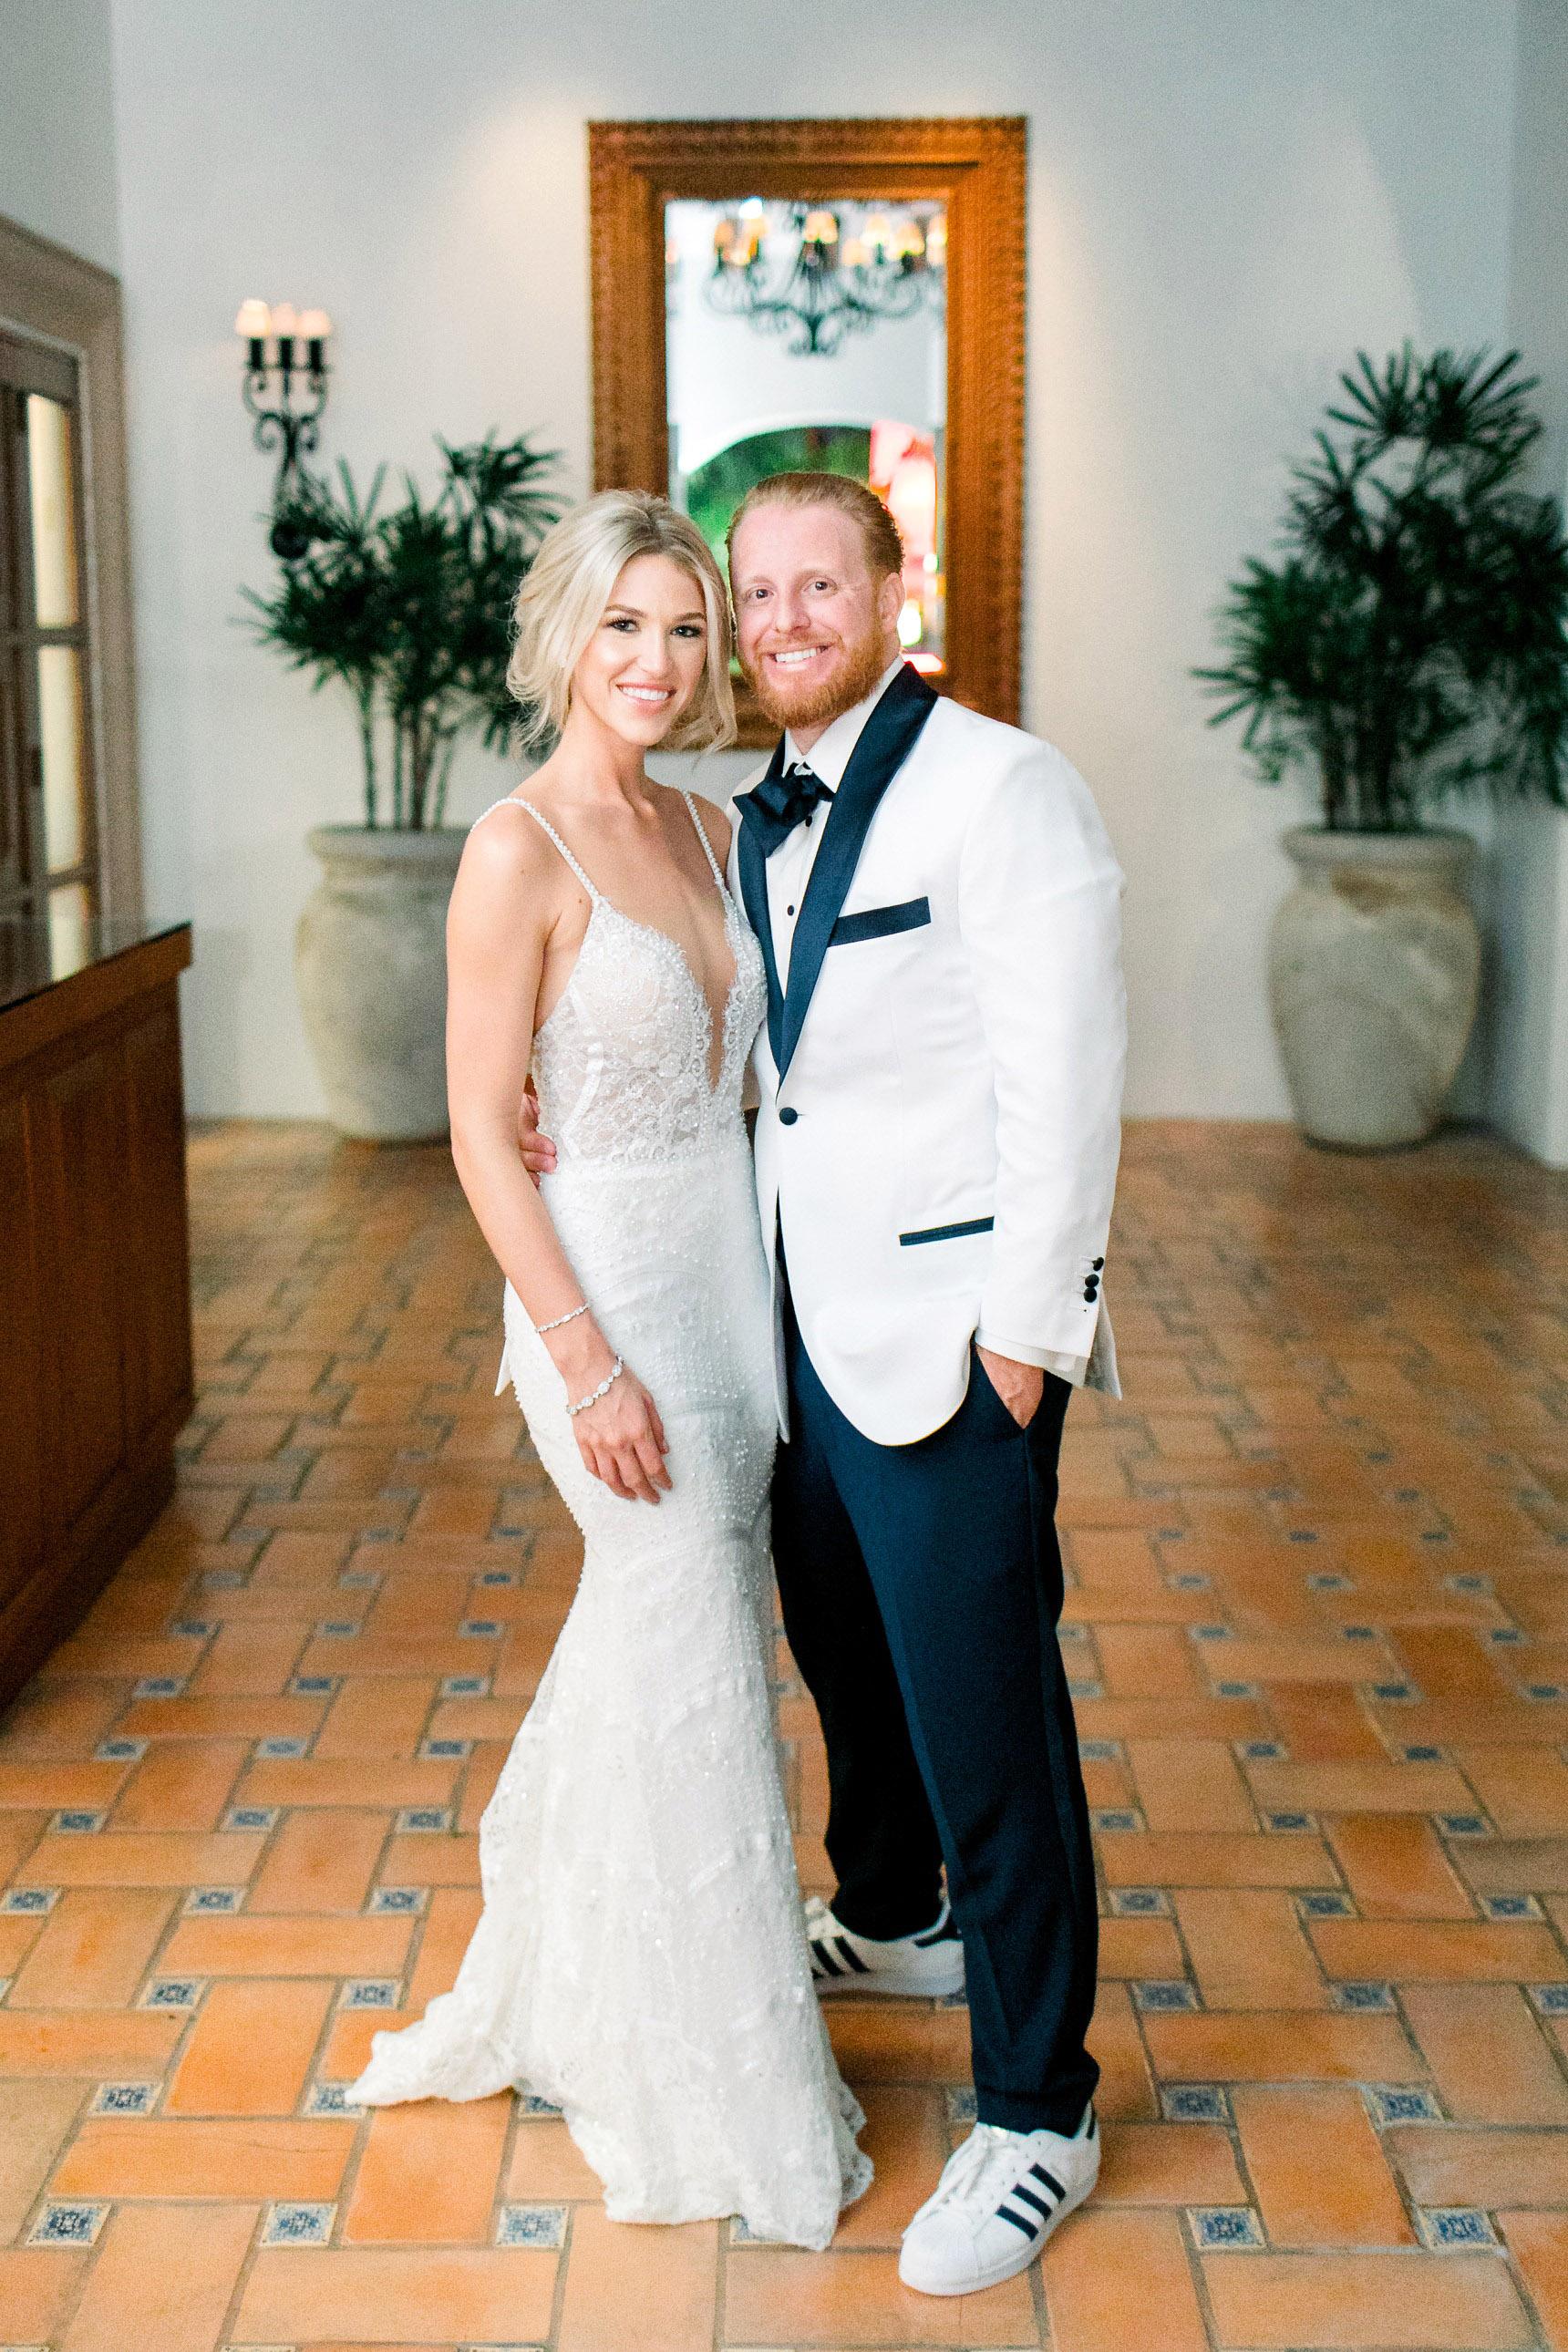 kourtney justin wedding mexico couple posing